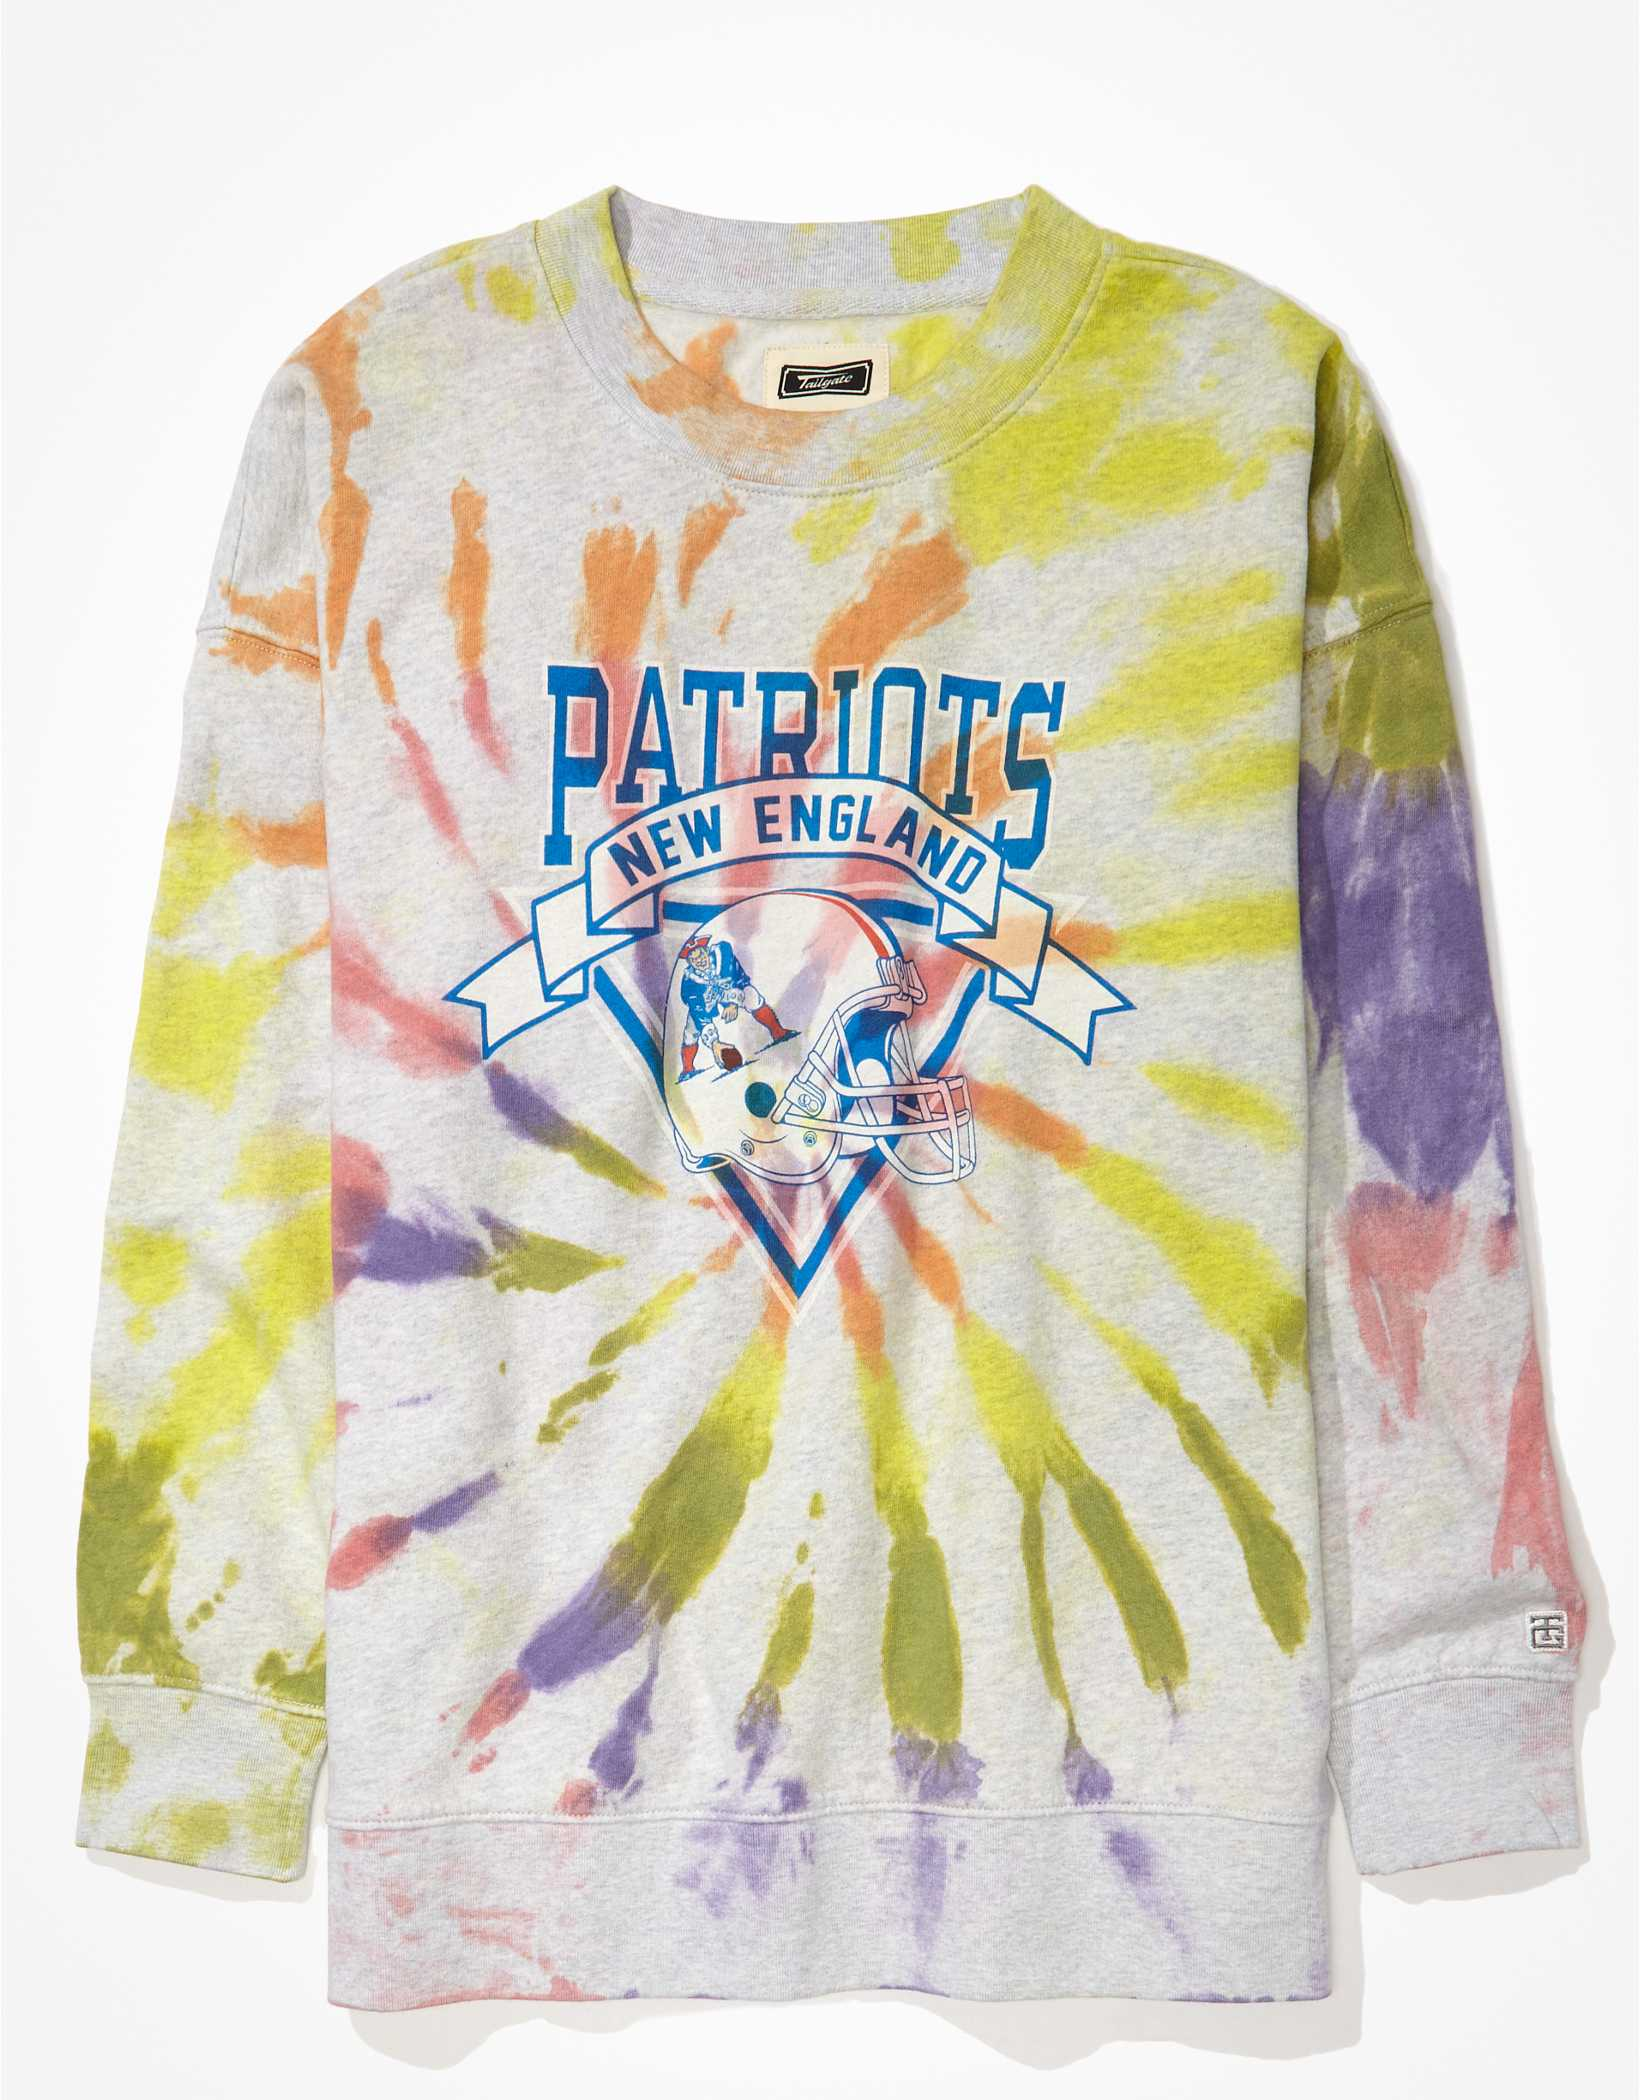 Tailgate Women's New England Patriots Oversized Tie-Dye Sweatshirt